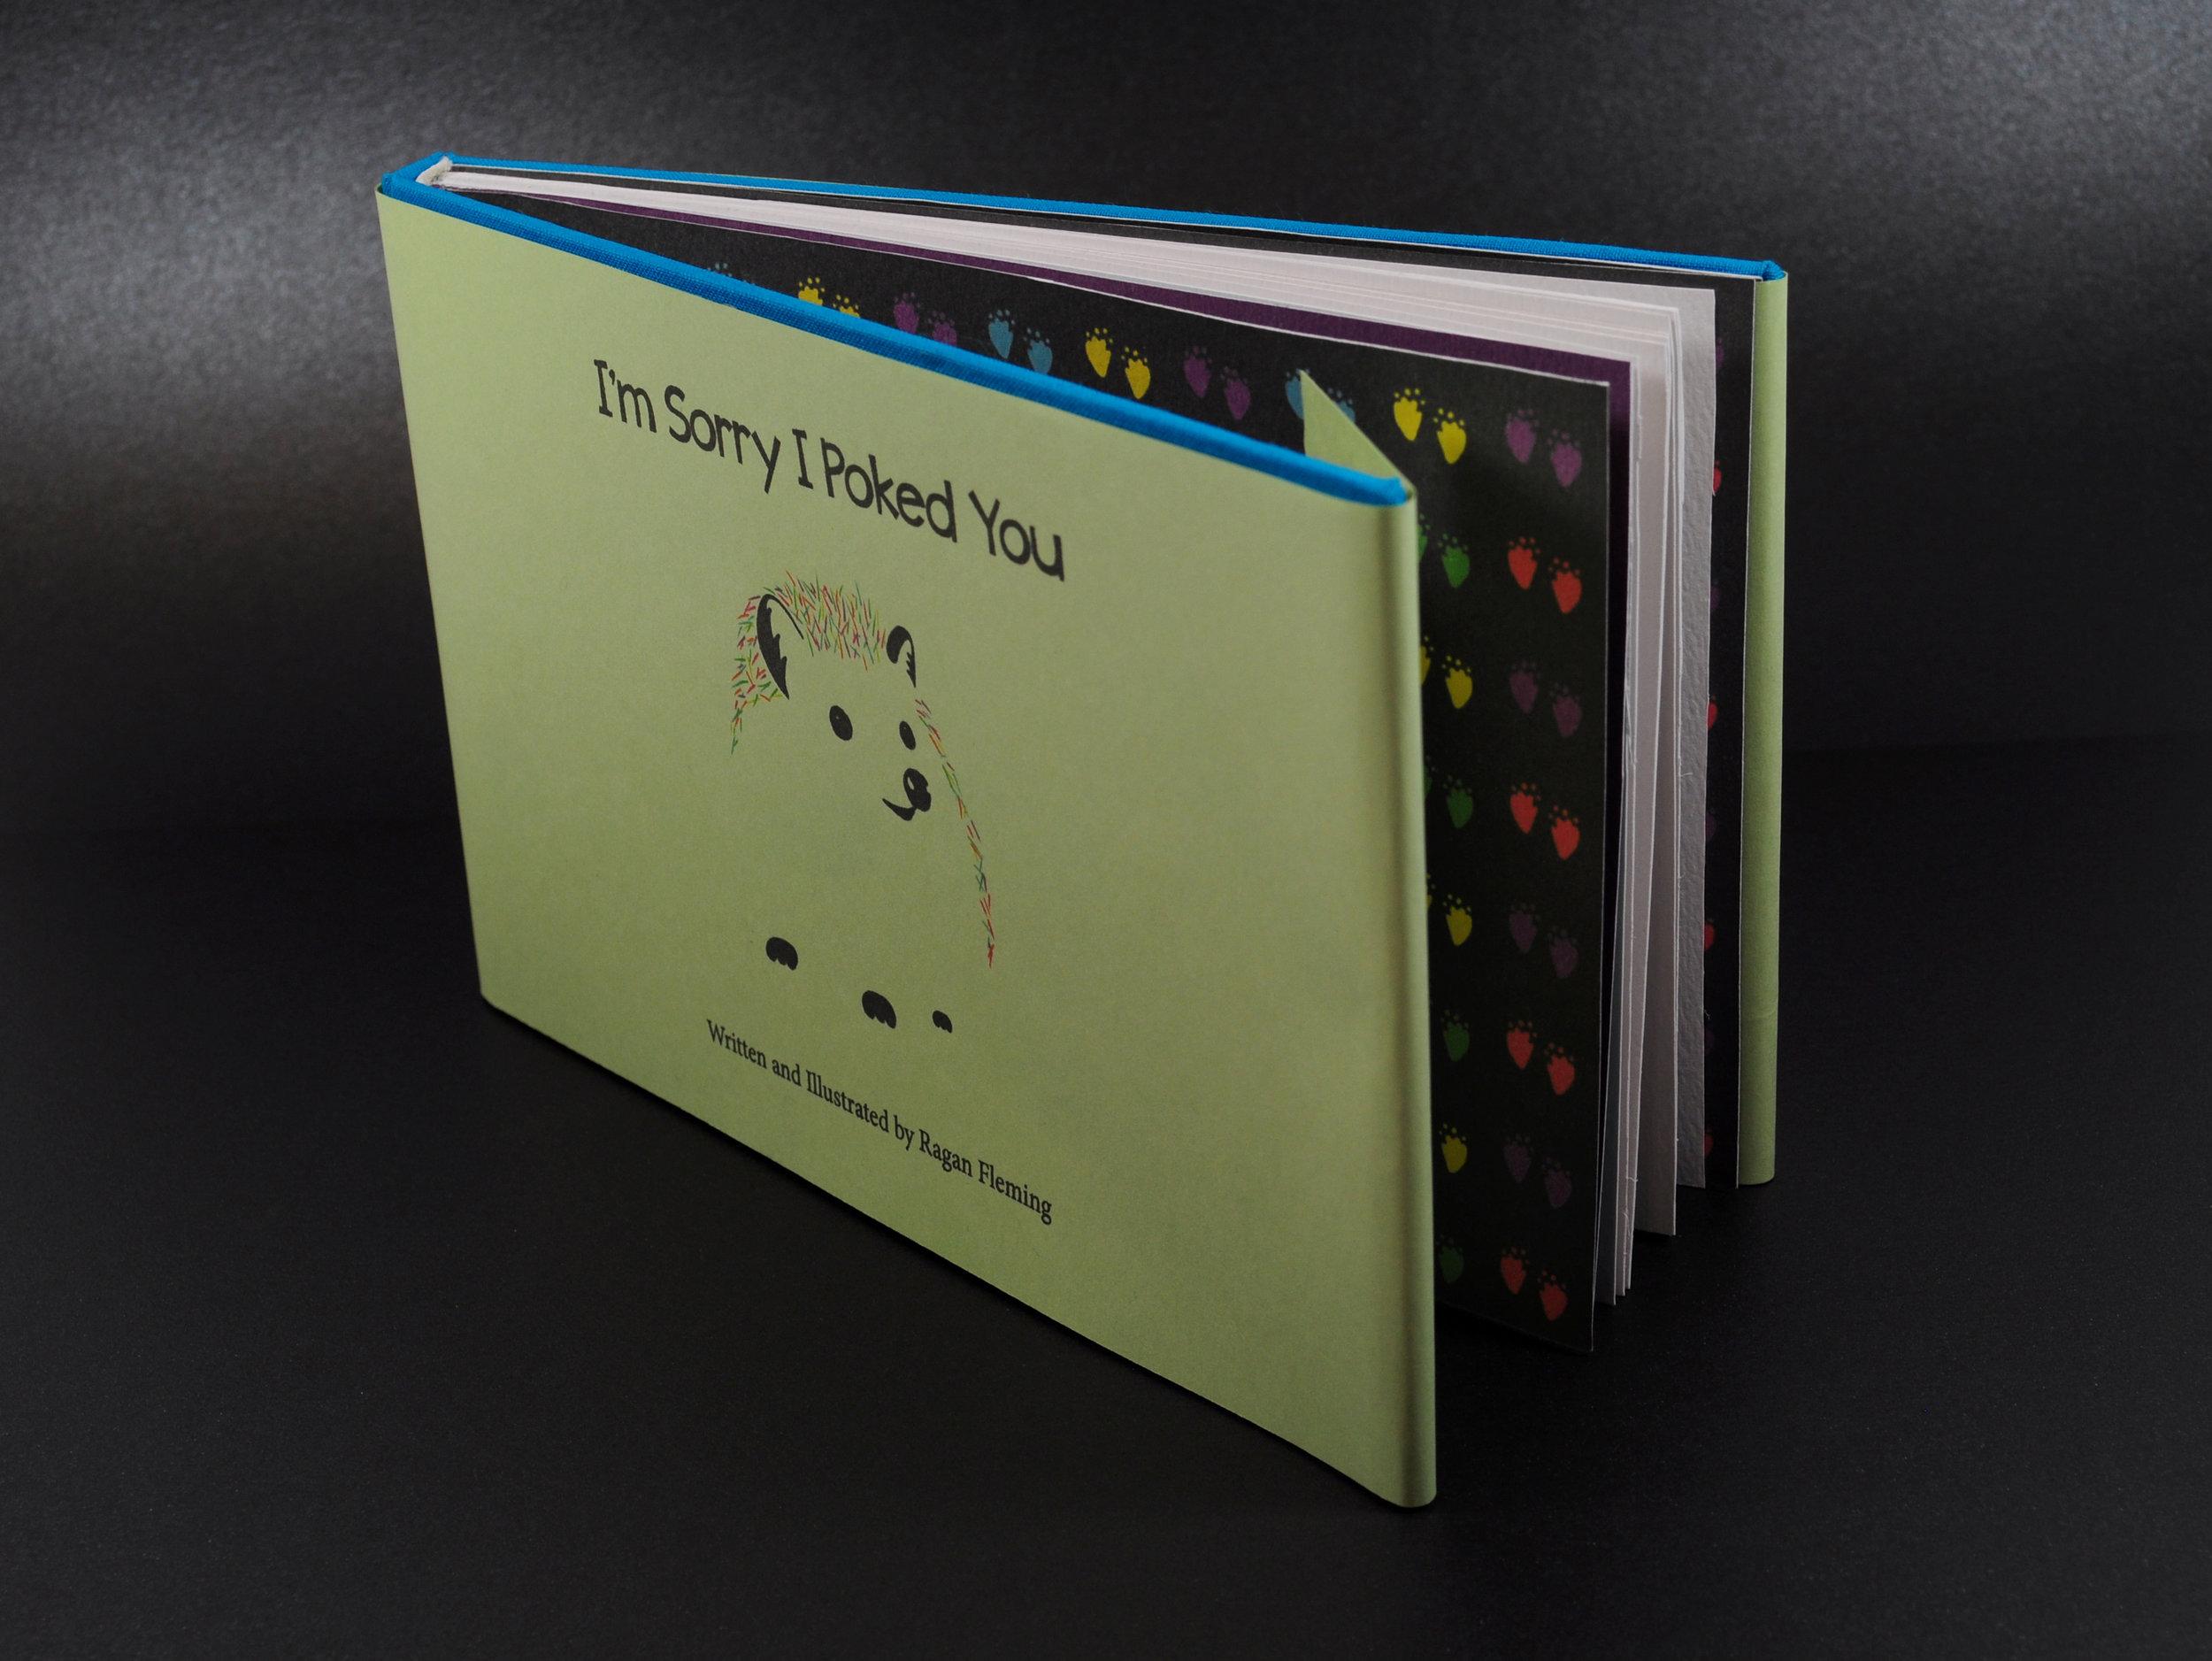 I'm Sorry I Poked You Book Design